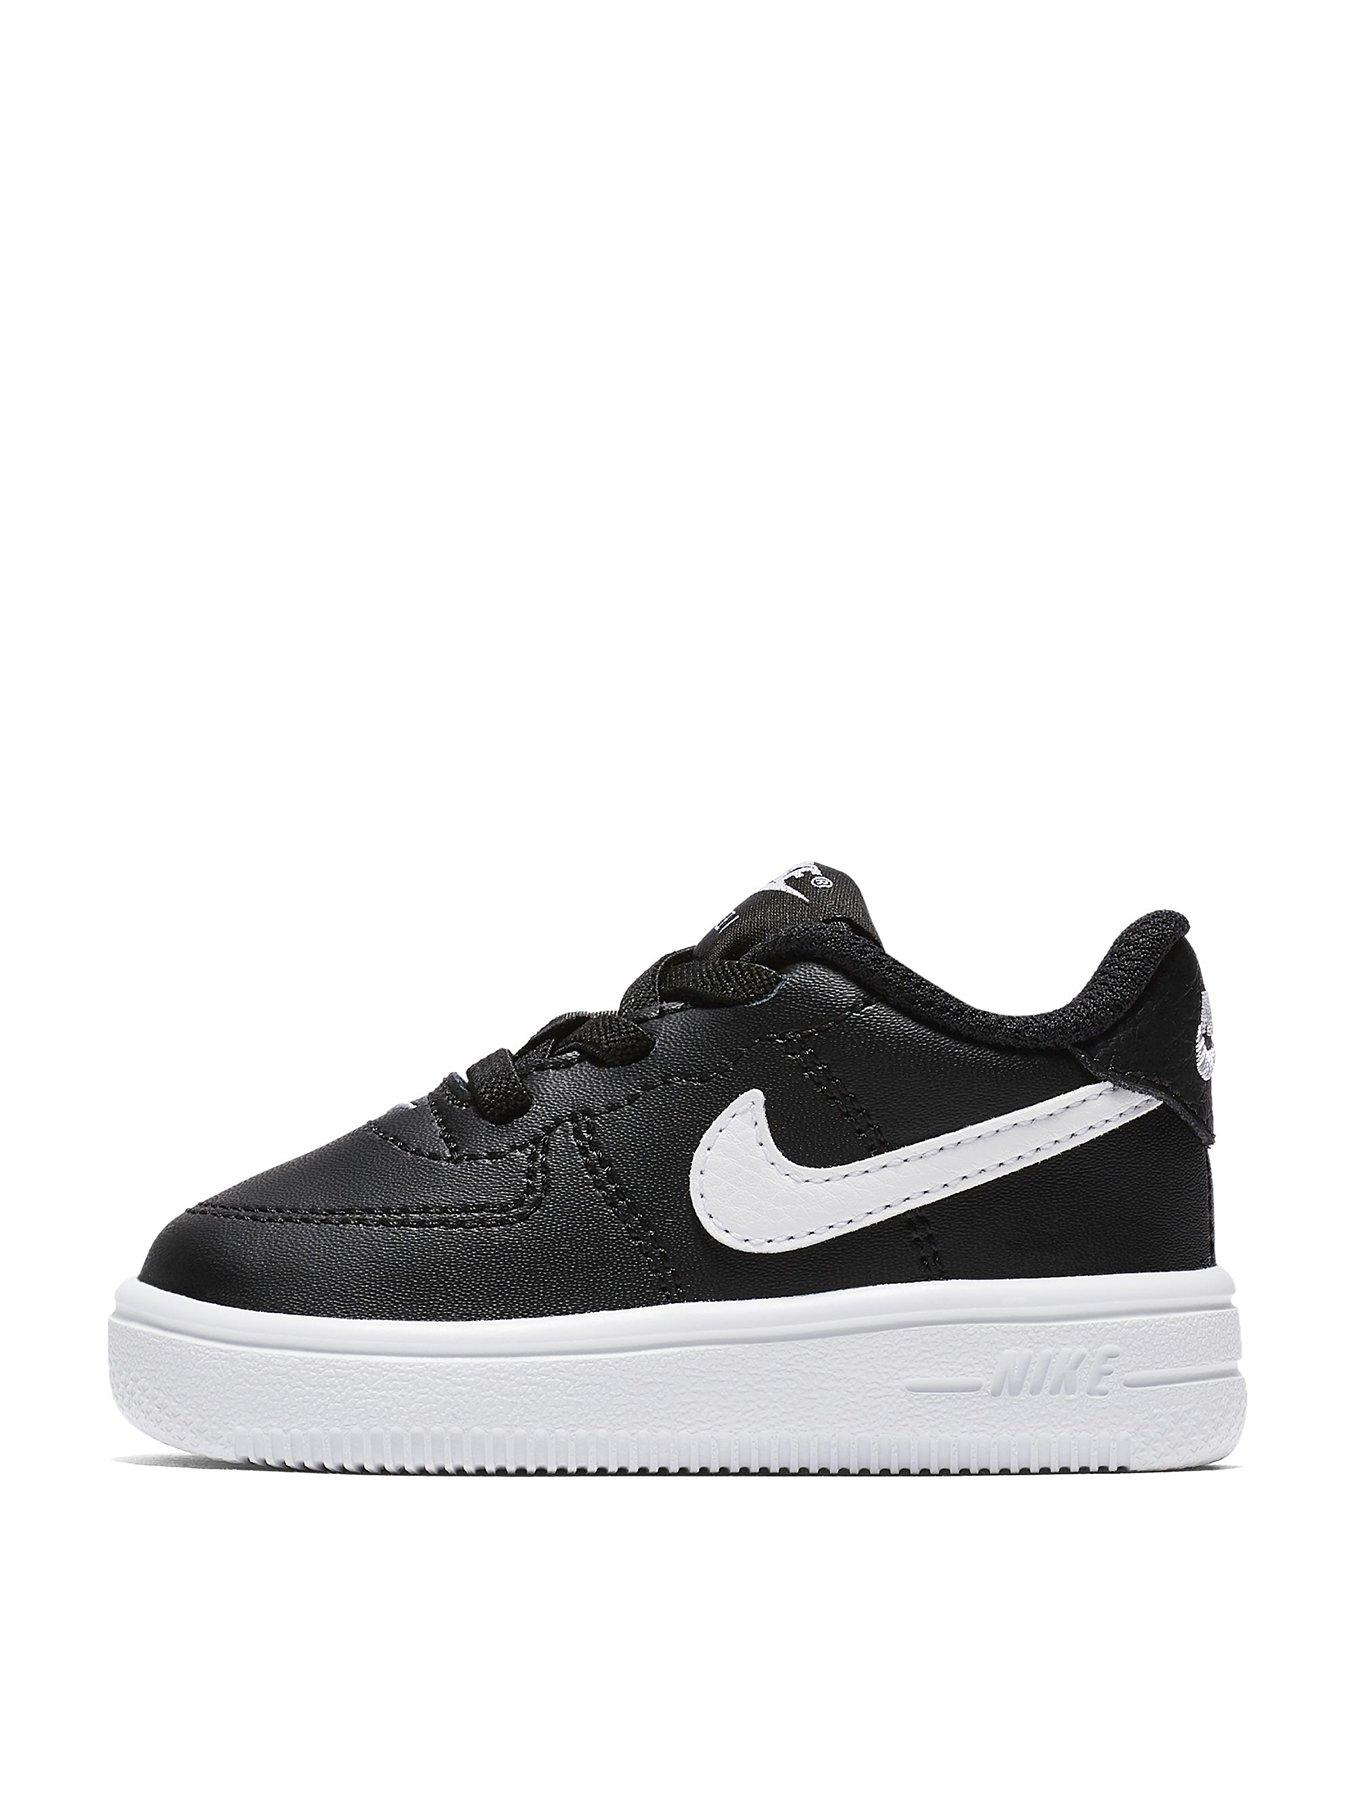 Nike Force Leisure Www Shoes Sports Baby Air 1Kidsamp; 0wkO8nP